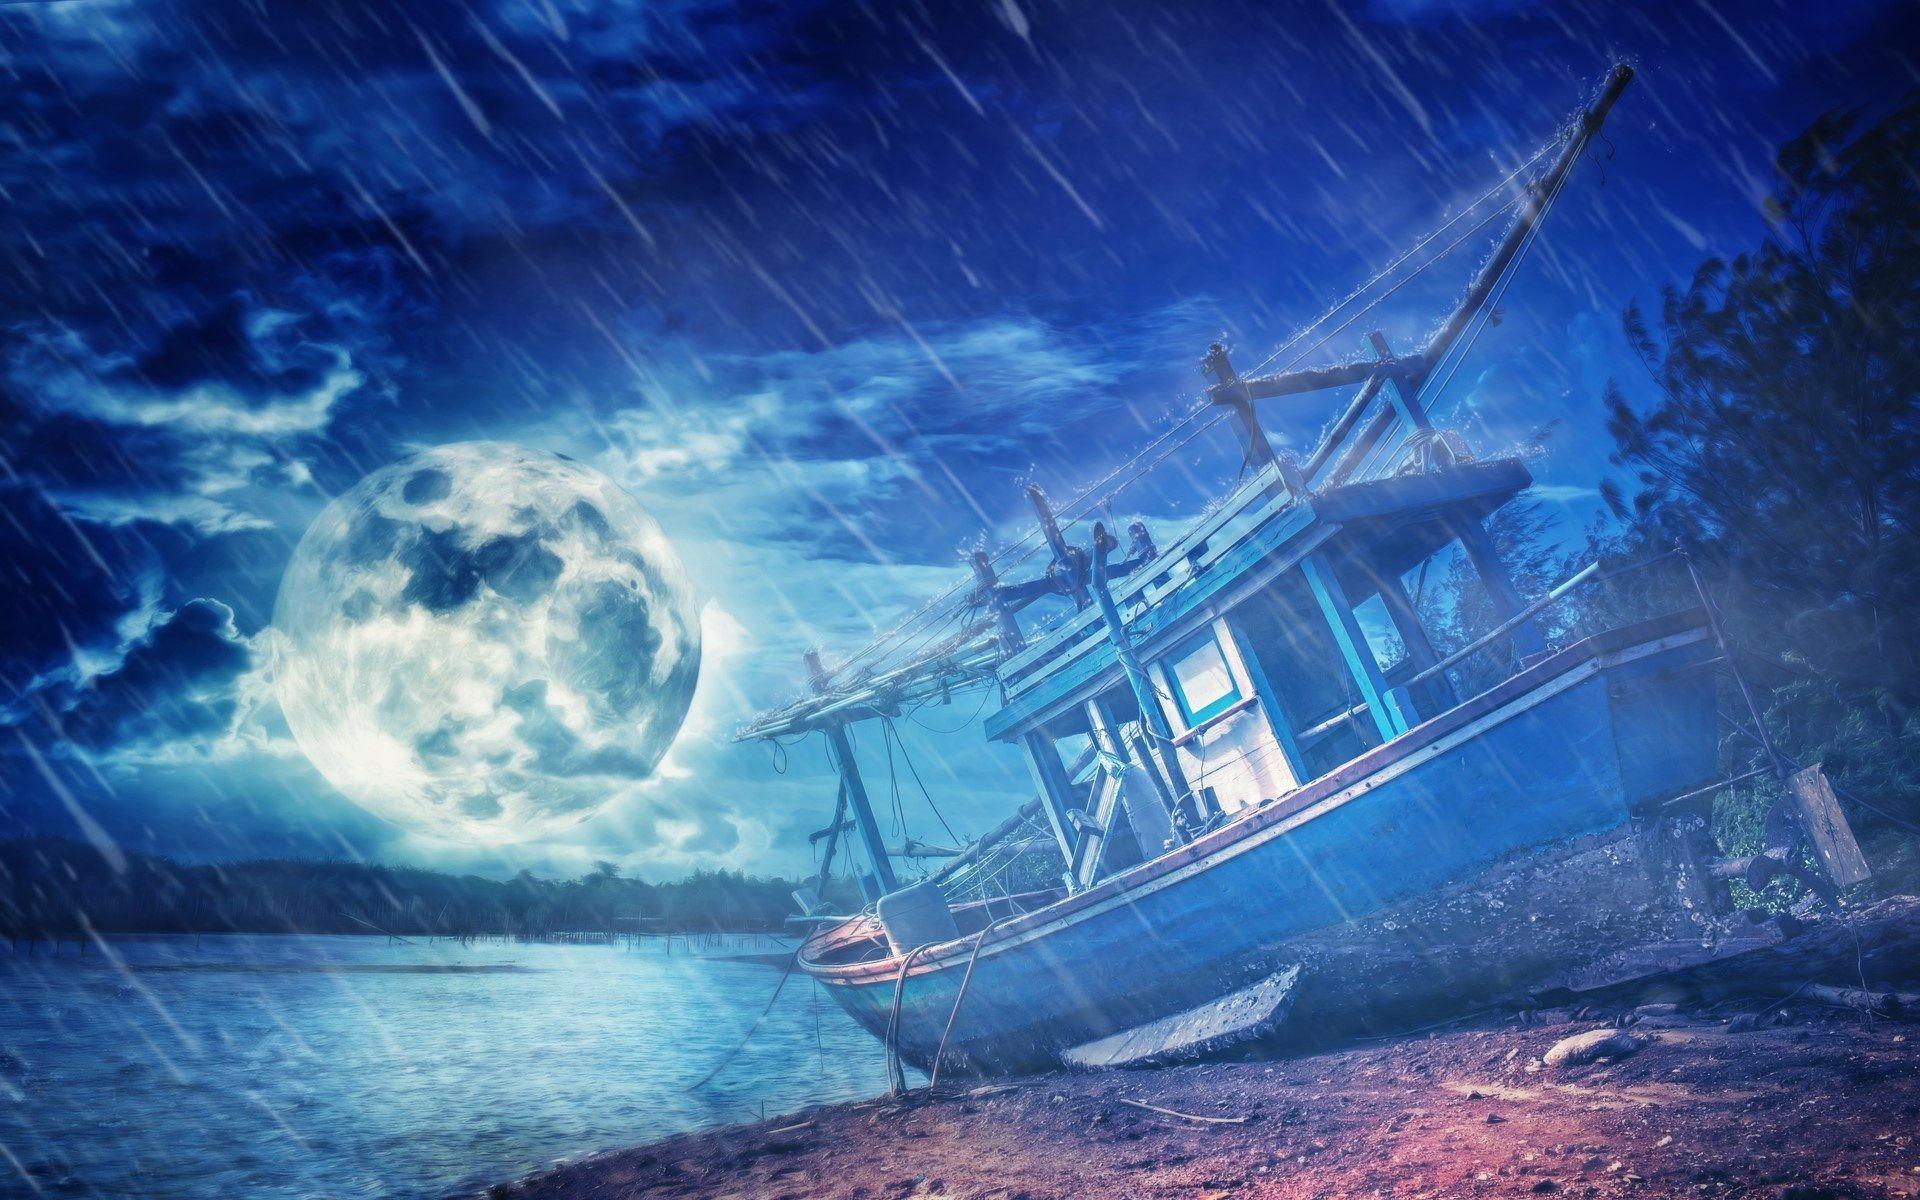 Stormy Night Sea Moon Fantasy Wallpaper